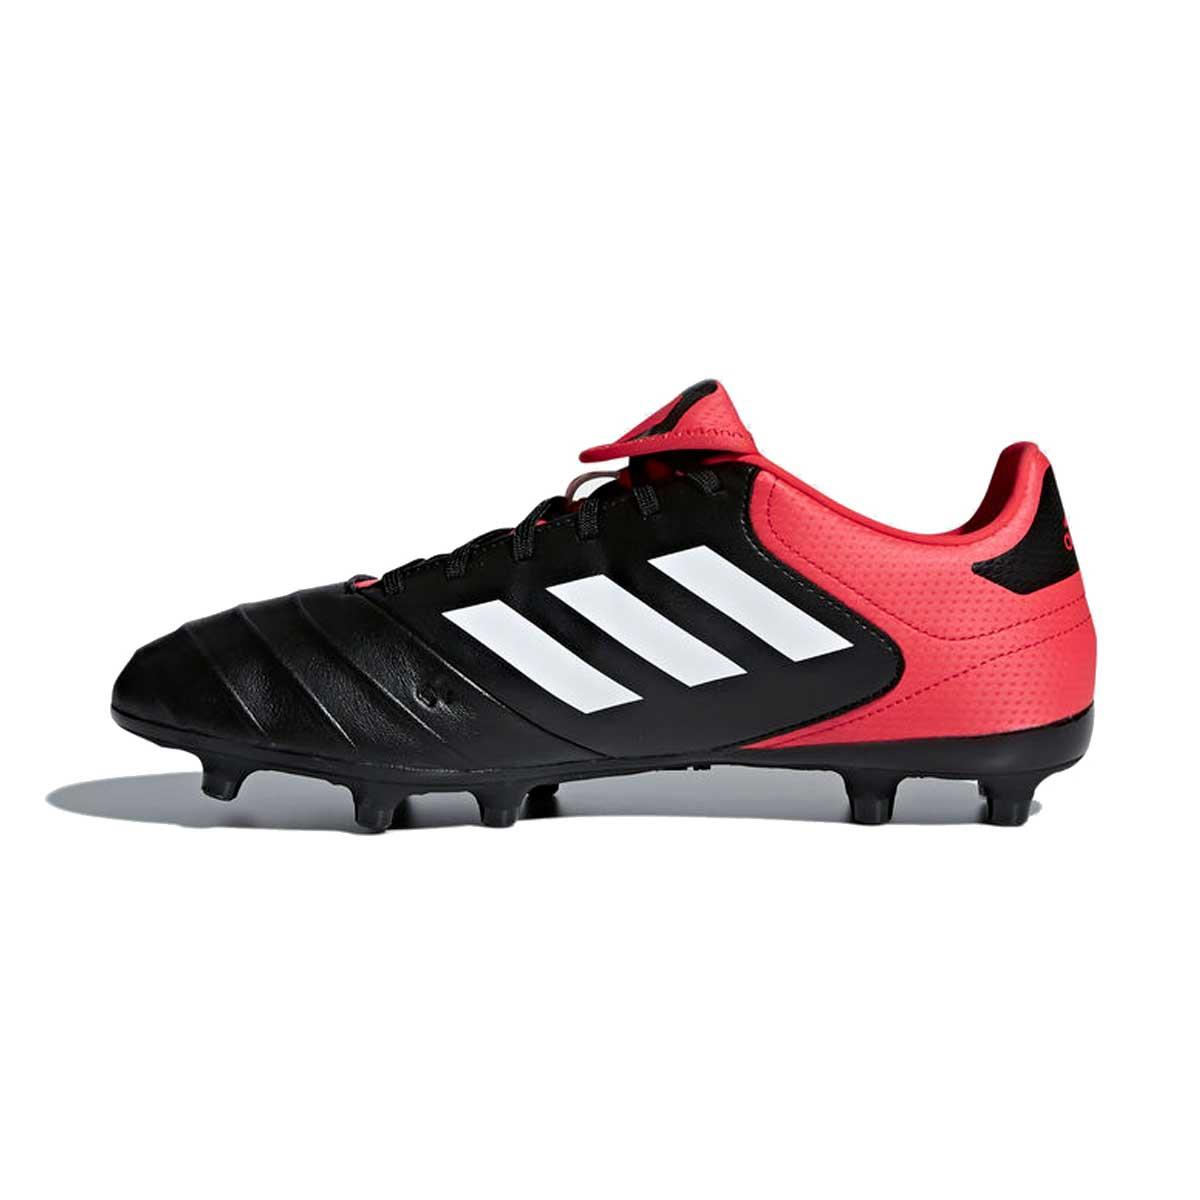 Chuteira Adidas Copa 18.3 Campo Masculino 8173625748244